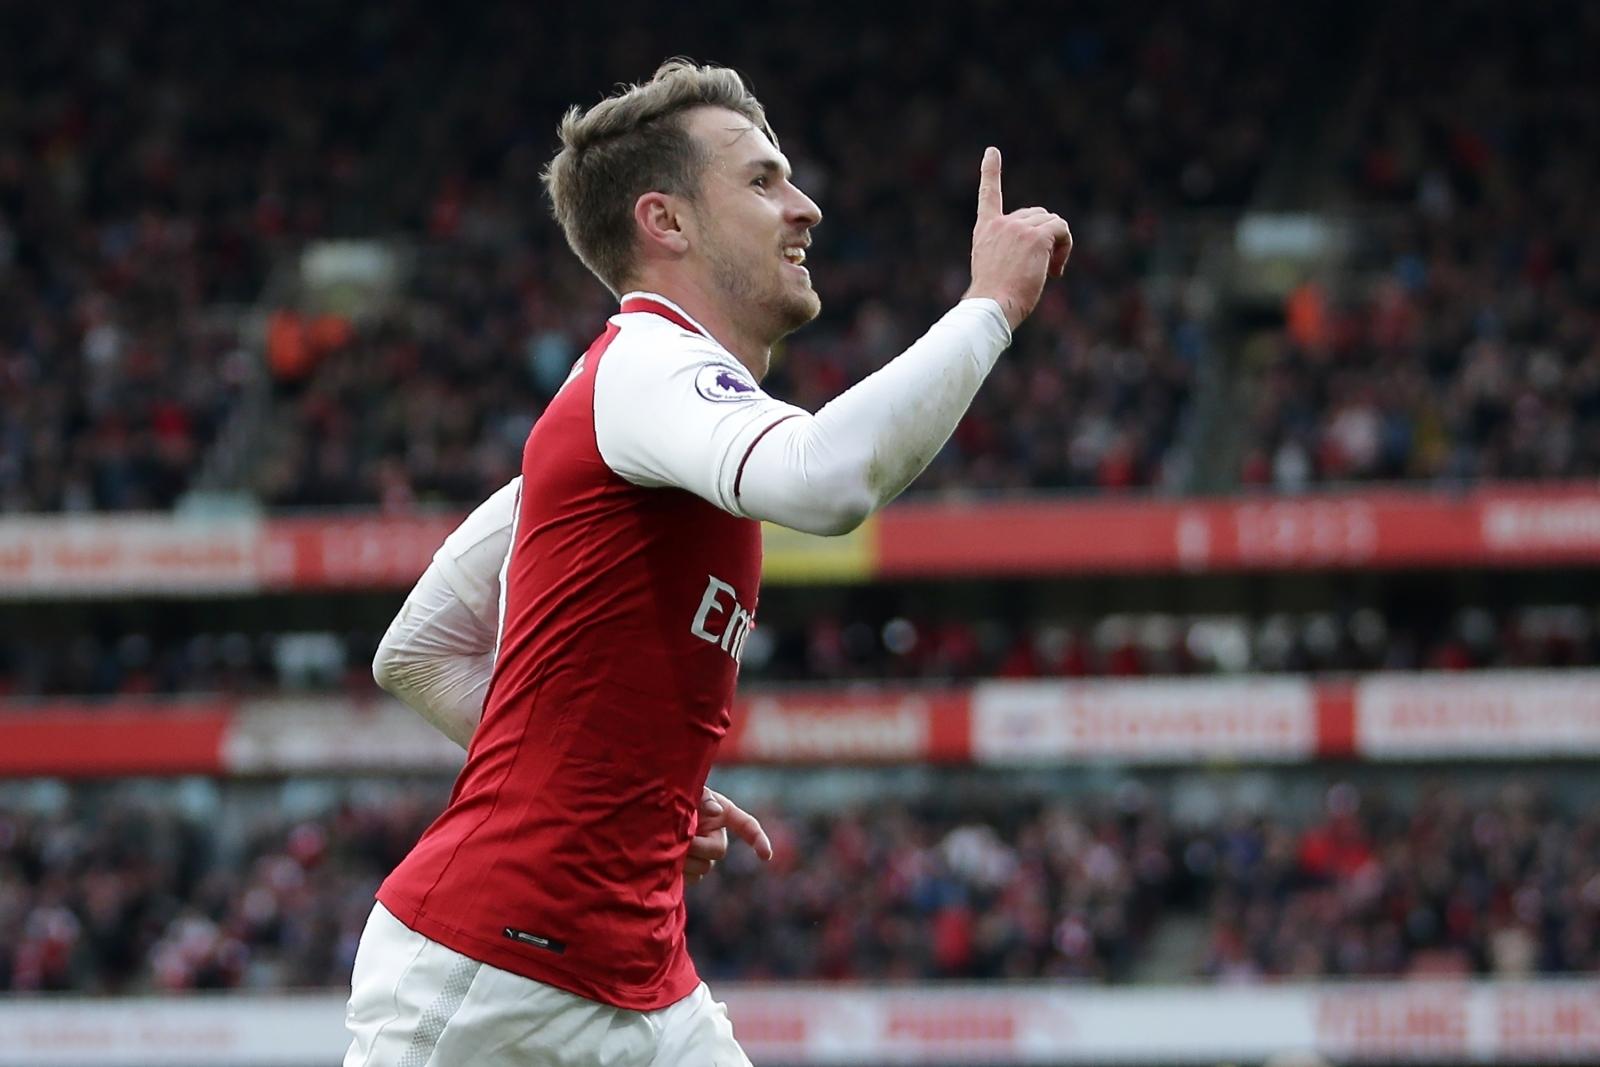 Arsenal midfielder Aaron Ramsey fit for Tottenham clash despite